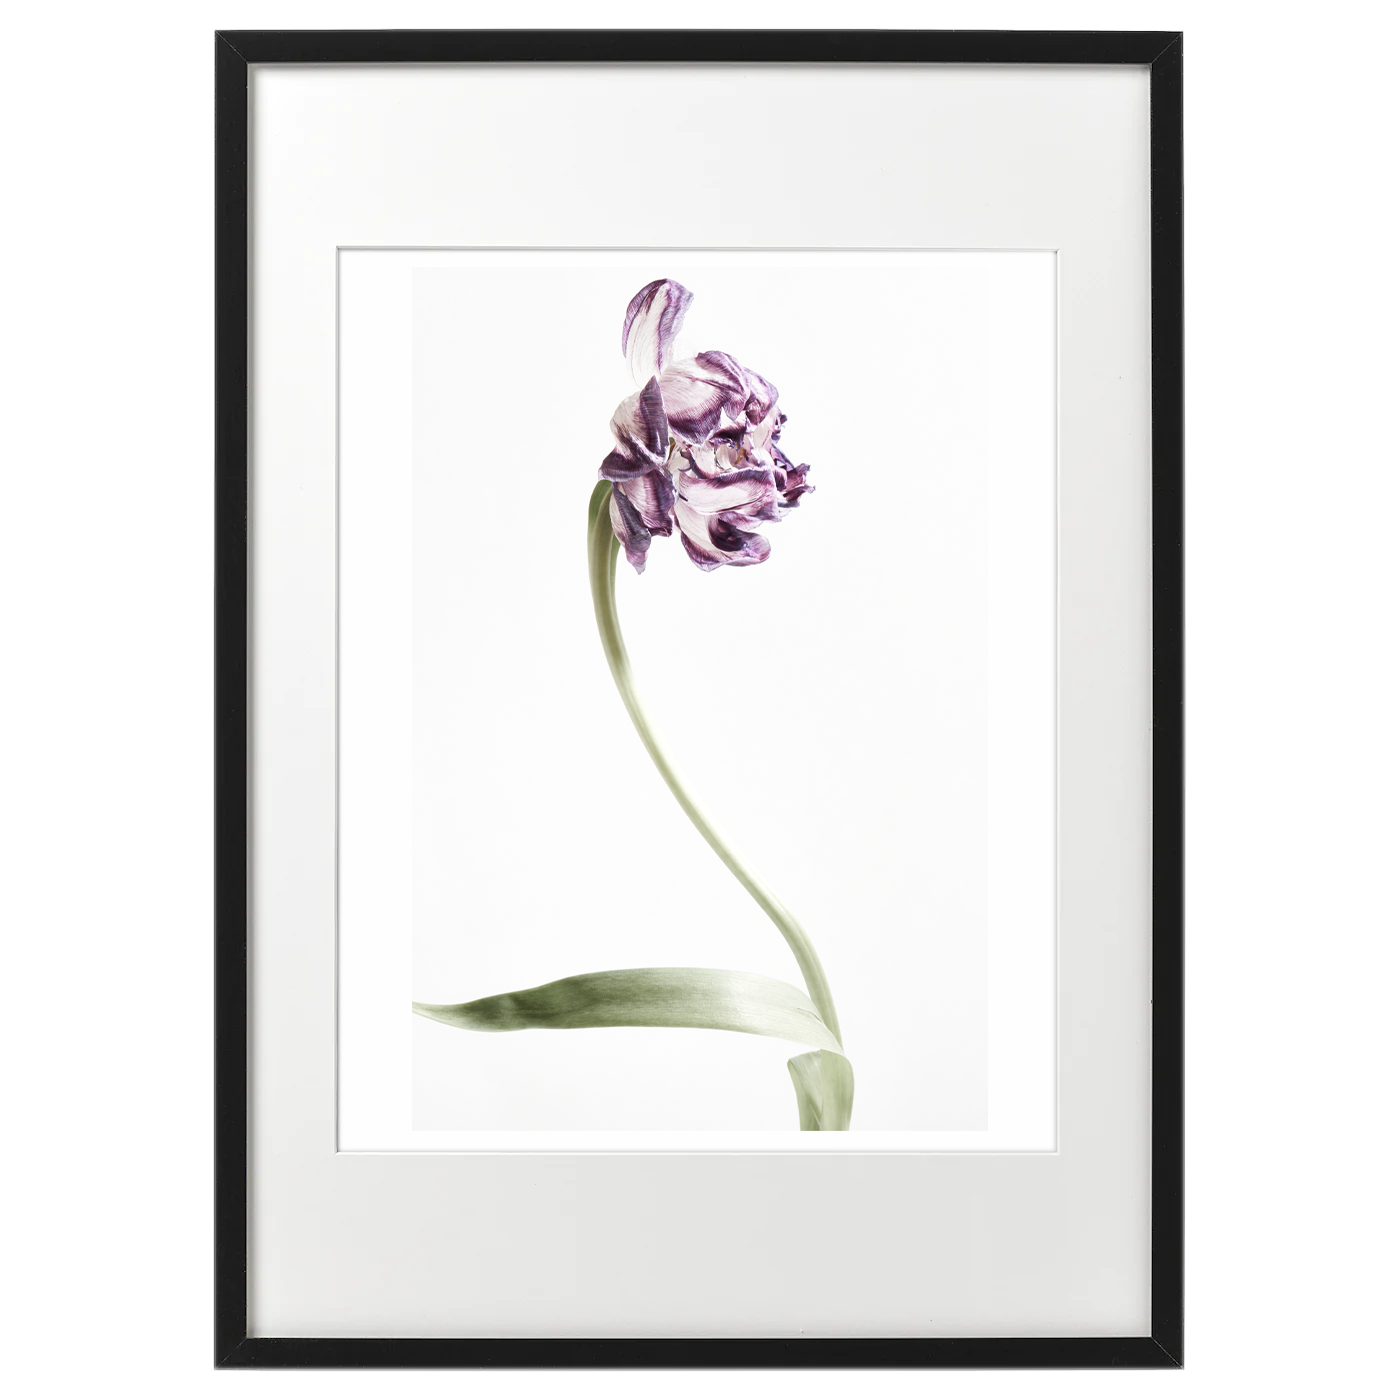 額装tulip_purple1767